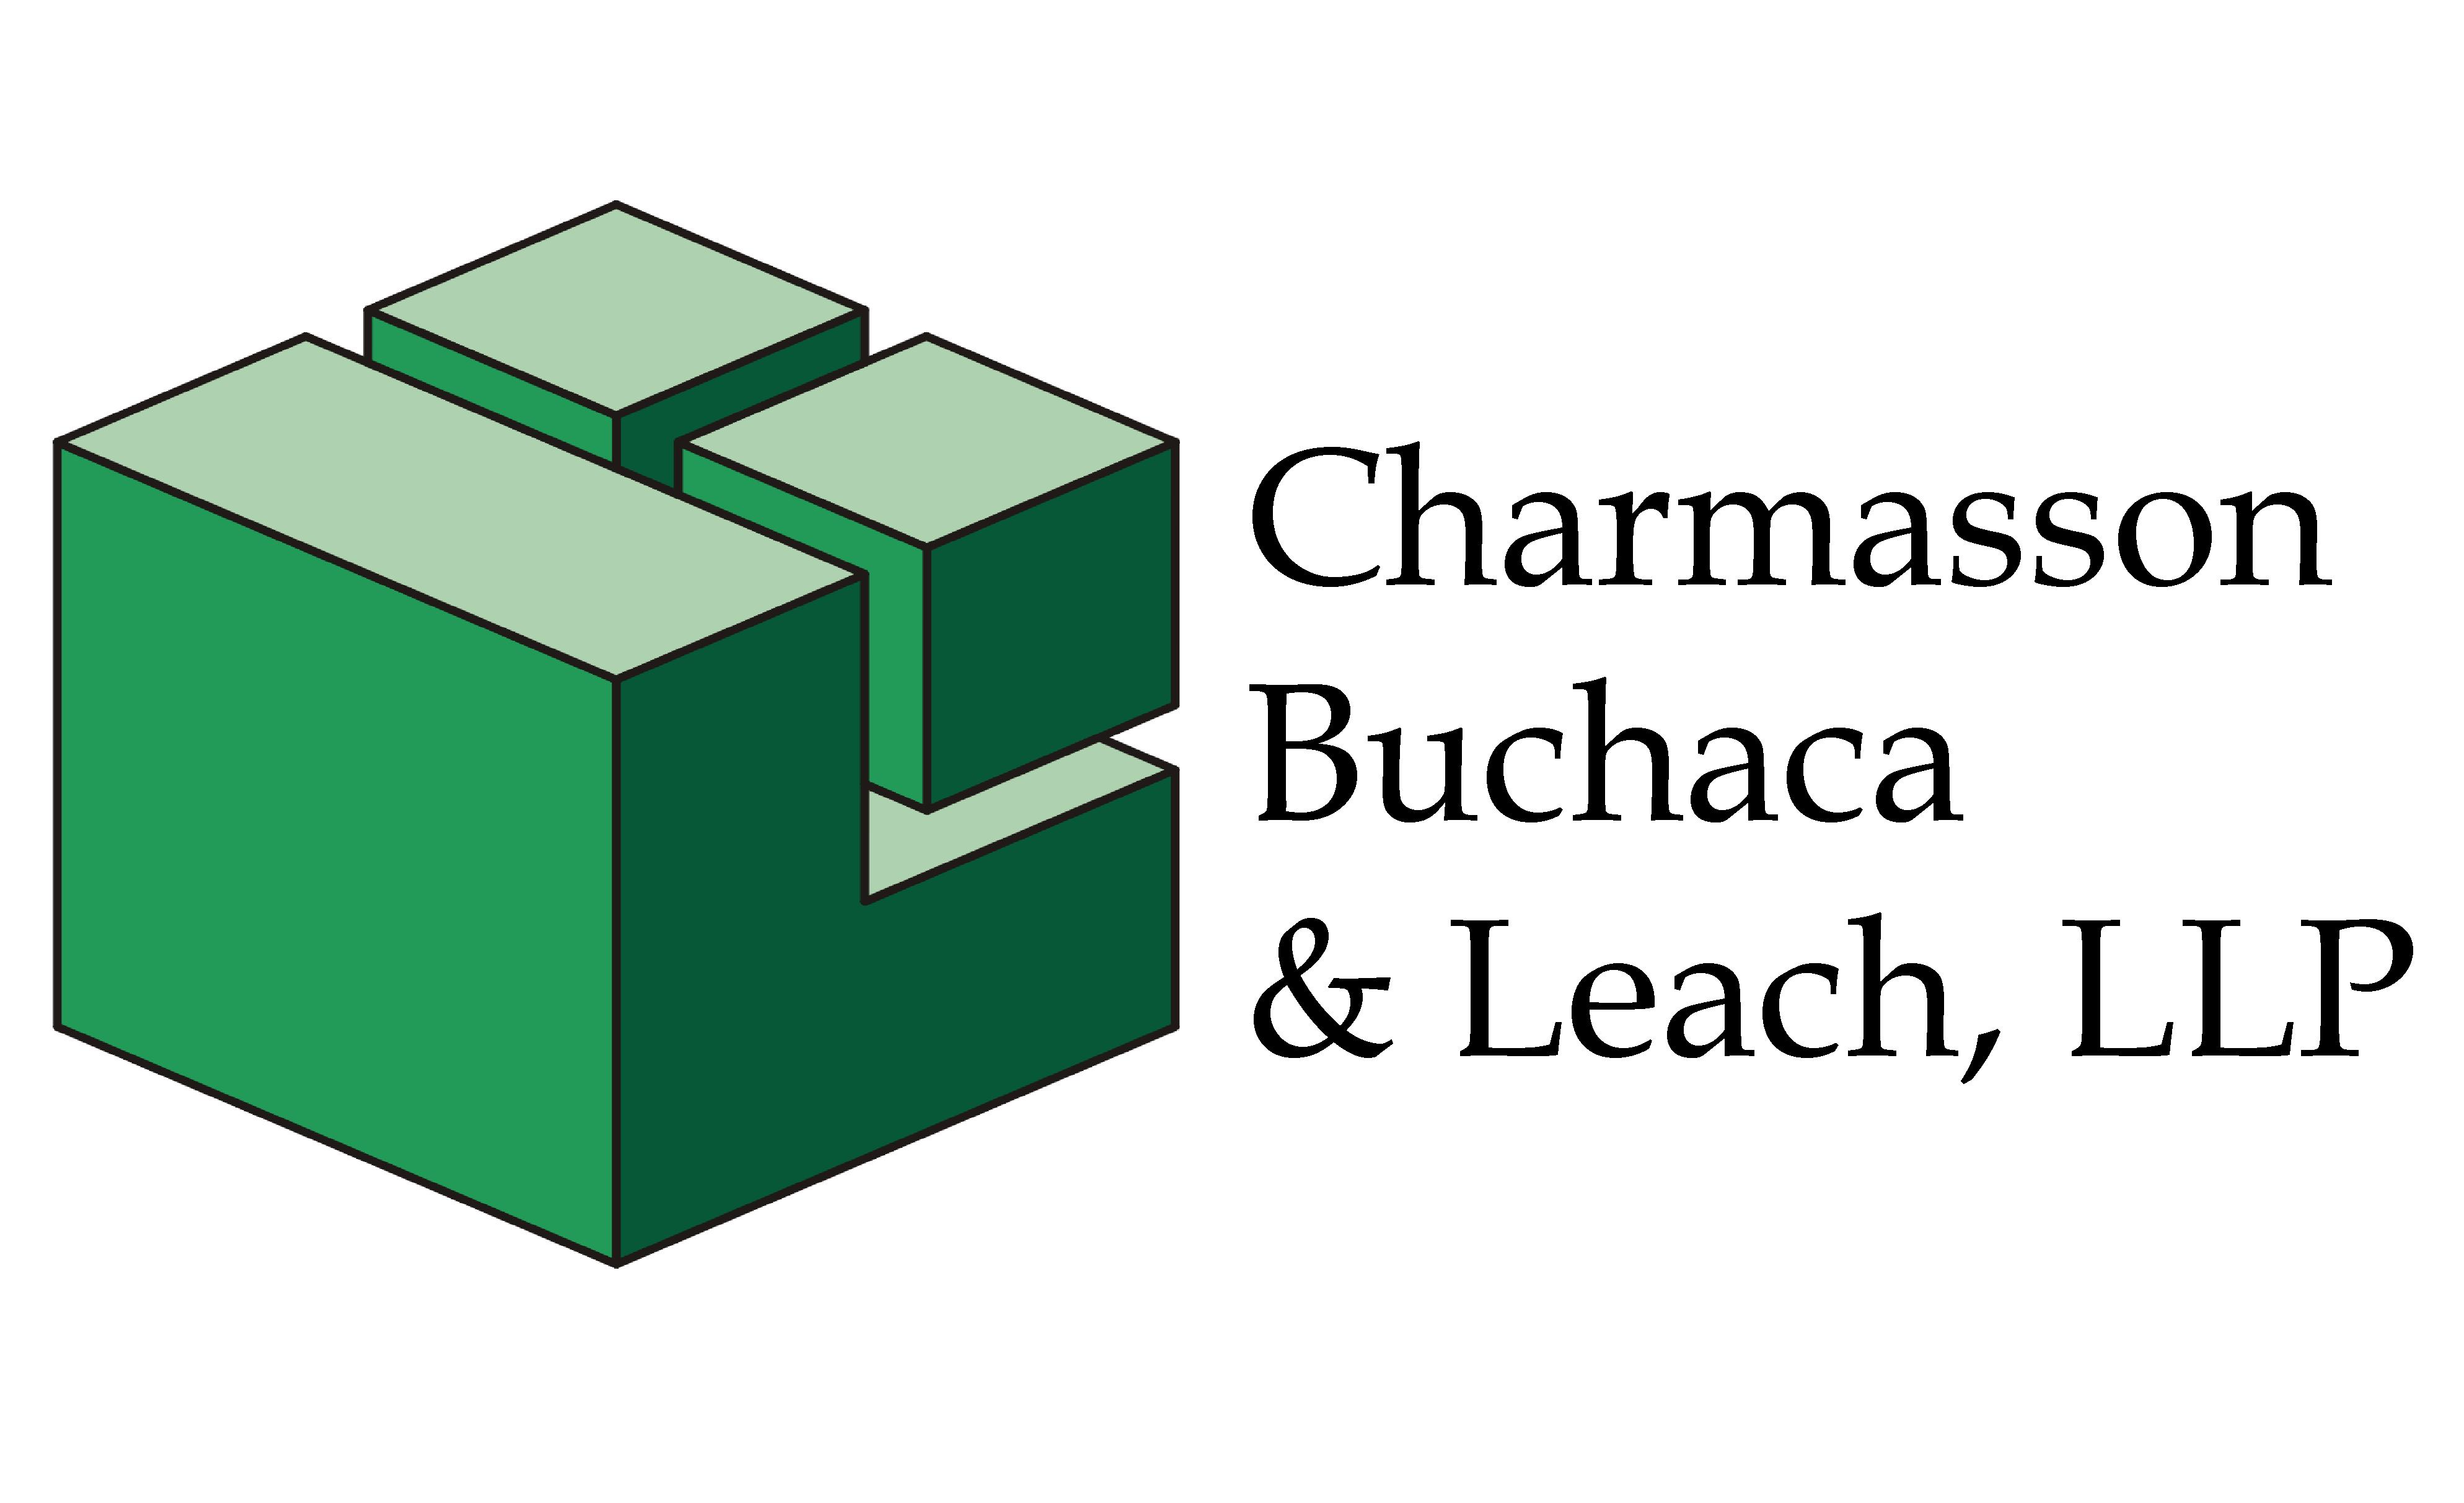 Charmasson, Buchaca & Leach